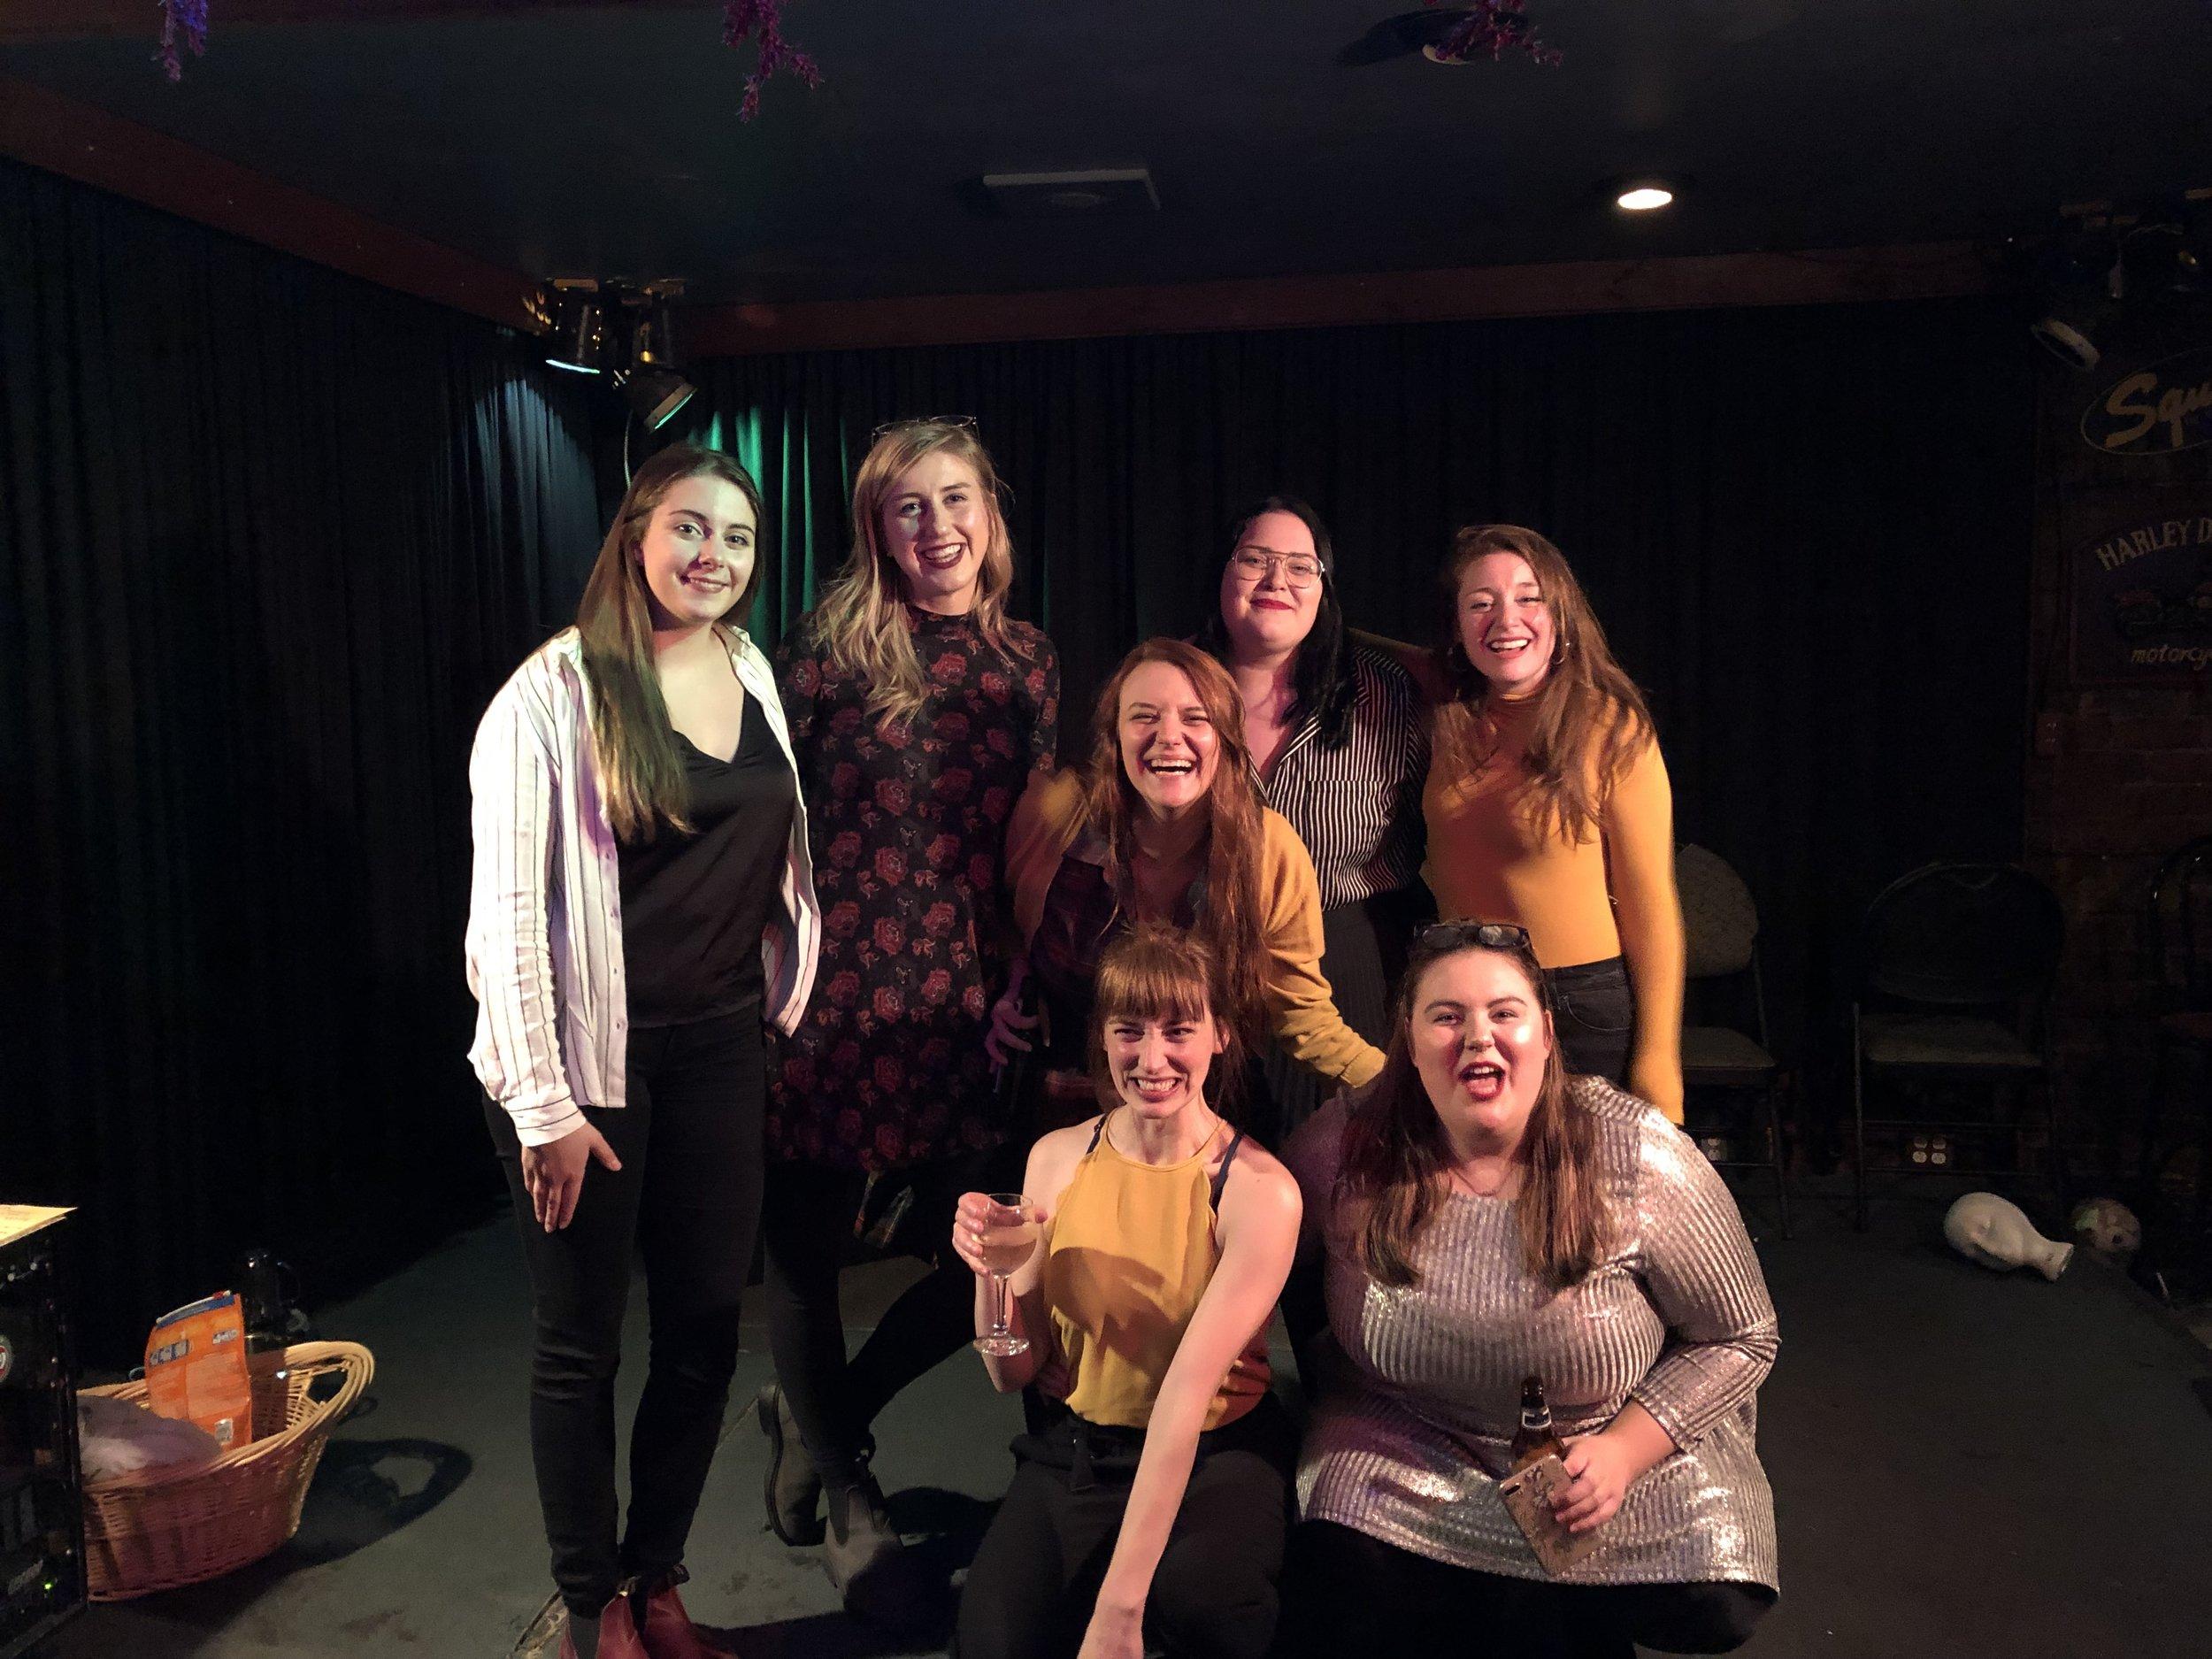 Back Row: Elizabeth Hicks, Katie Thompson, Bree Parsons, Stephanie Curran, and Allison Kelly Front Row: Andie Bulman, and Lauren Lambe.